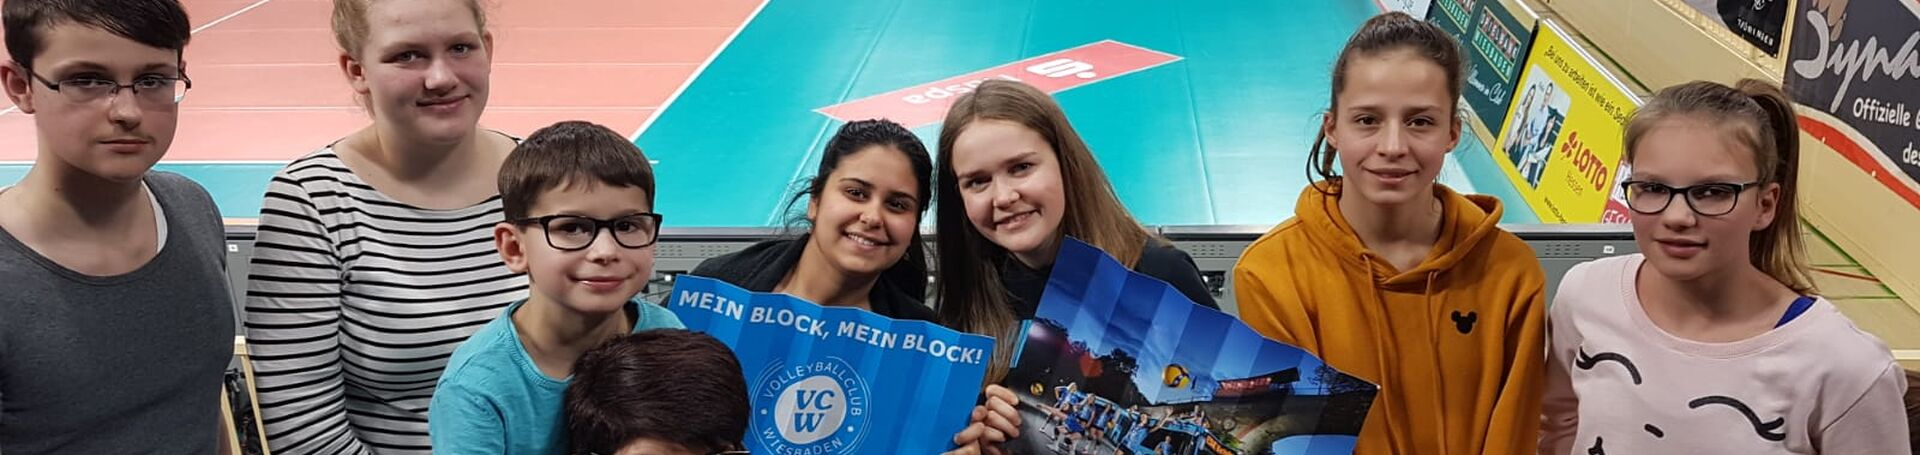 Ausflug zum Bundesligaspiel